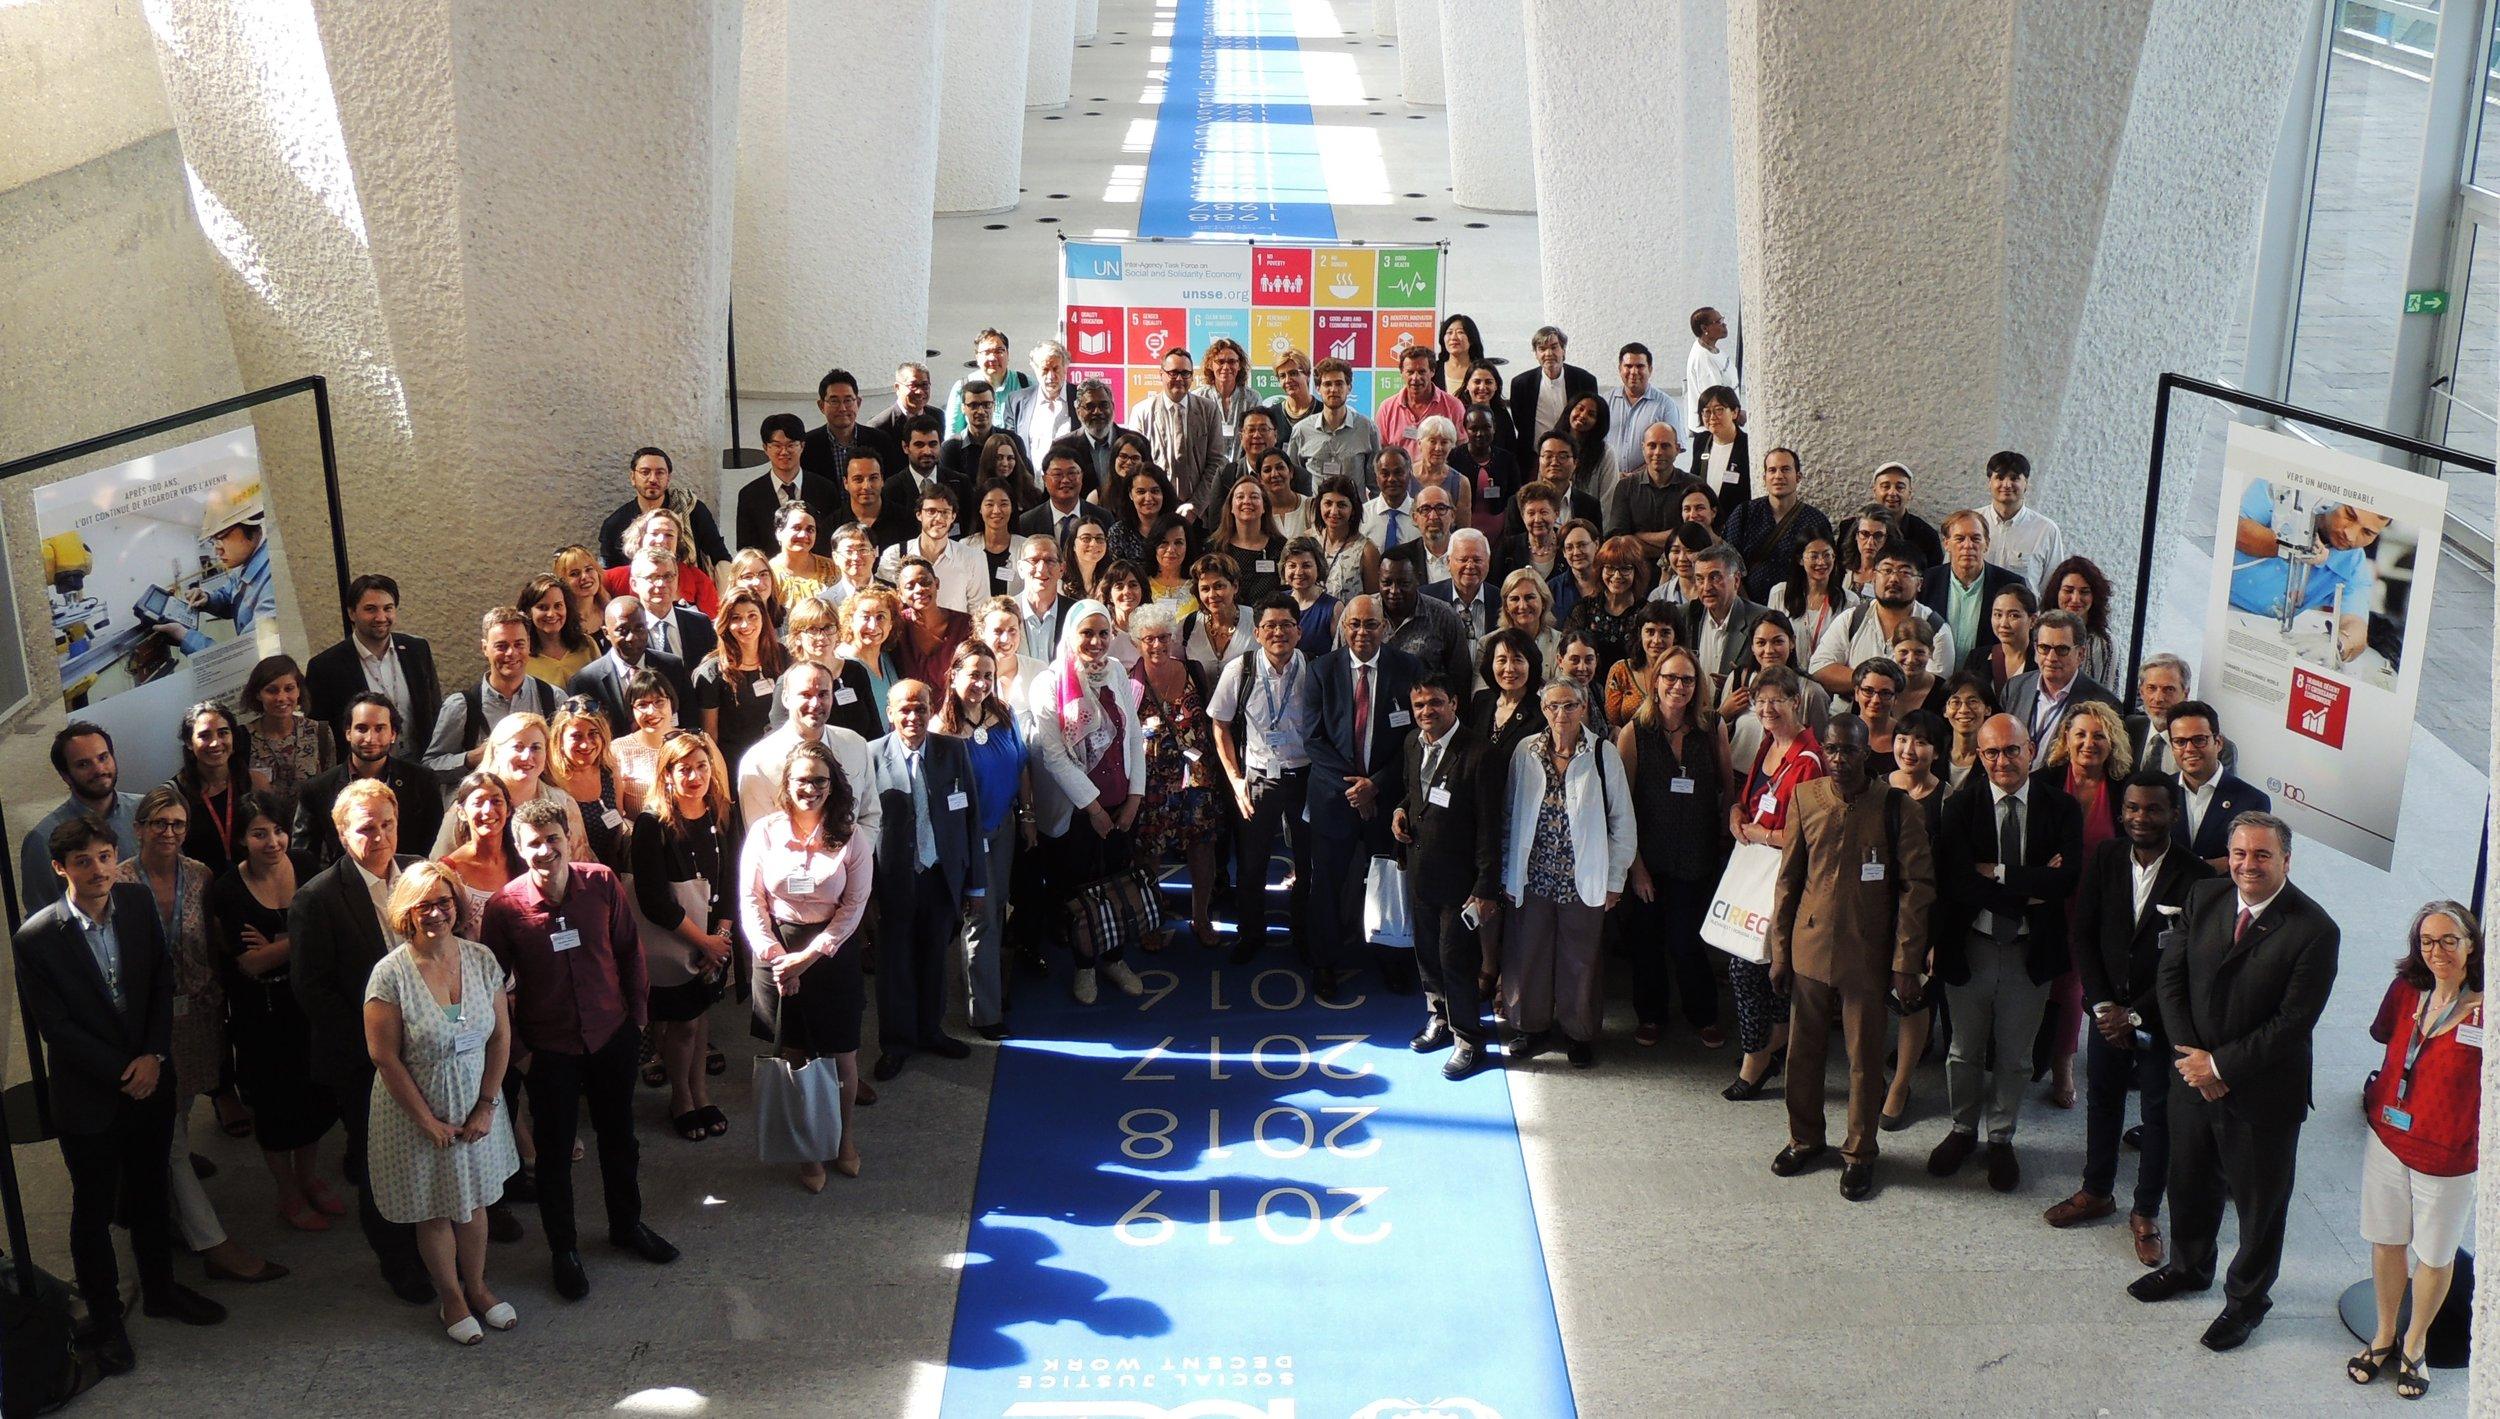 UNTFSSE-Conference-Group-Photo_cut2.jpg